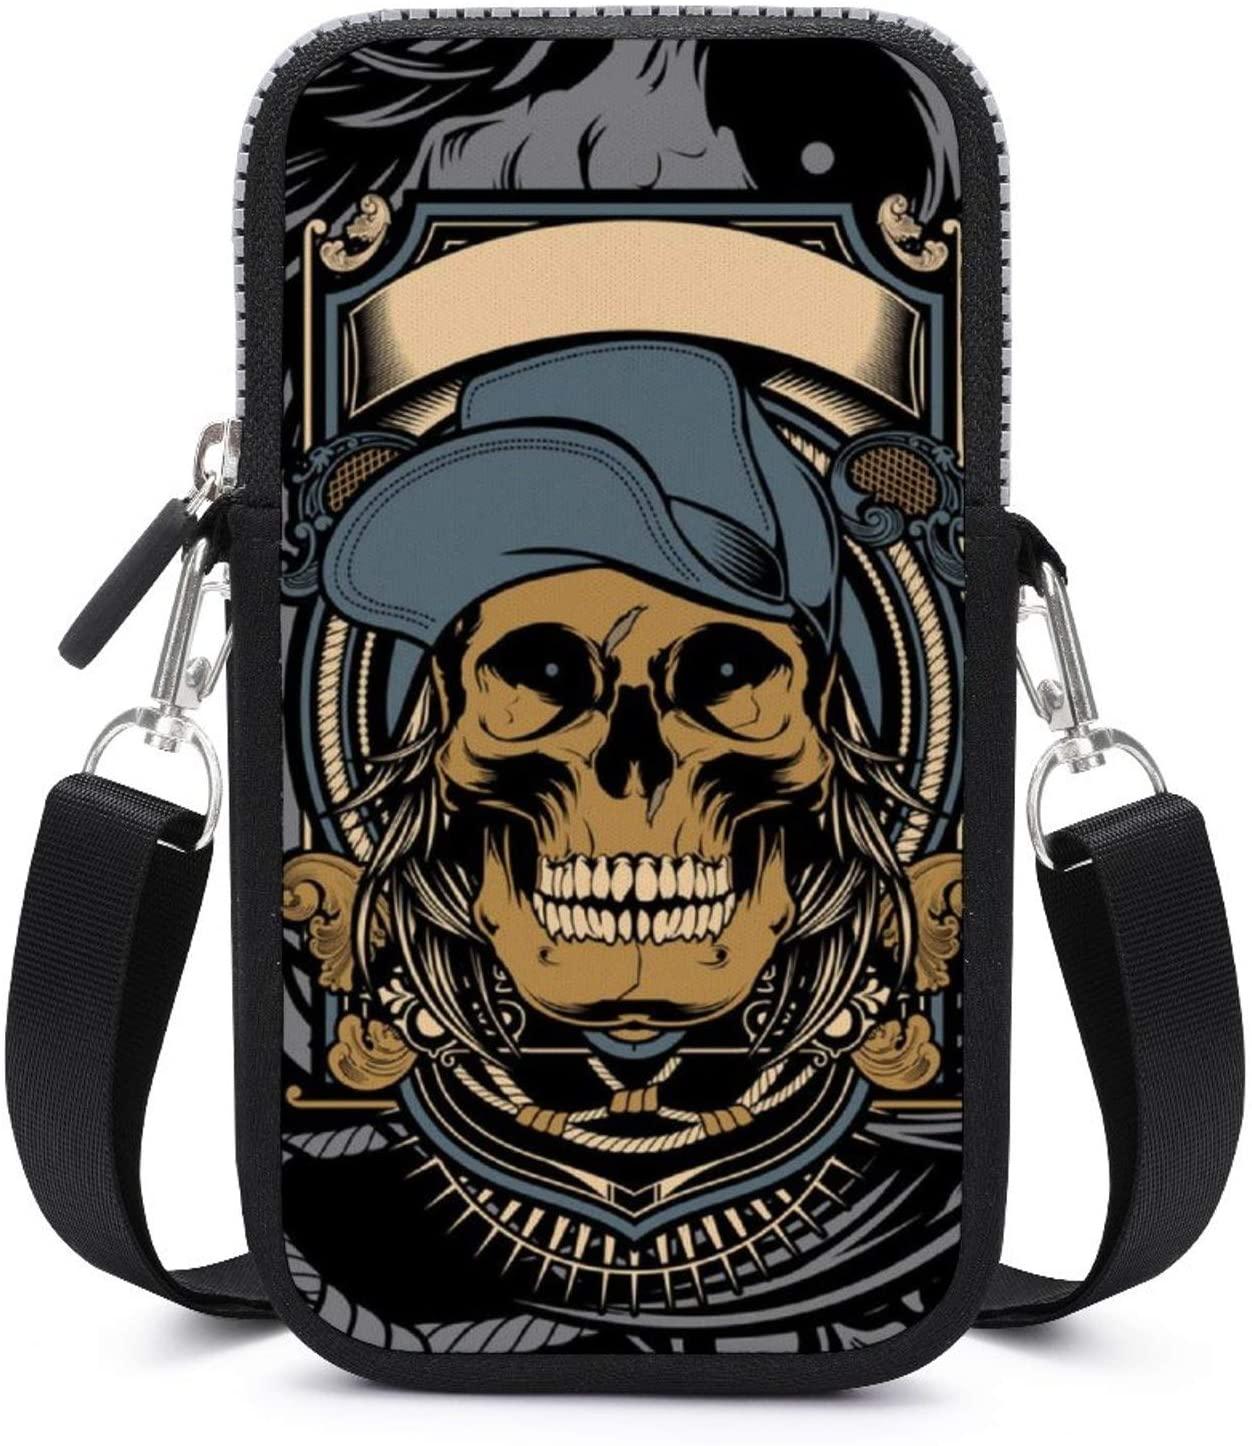 NiYoung Fashion Cell Phone Purse for Women and Girls - Small Crossbody Bag Shoulder Bag (Skull Cross Bone Pattern)